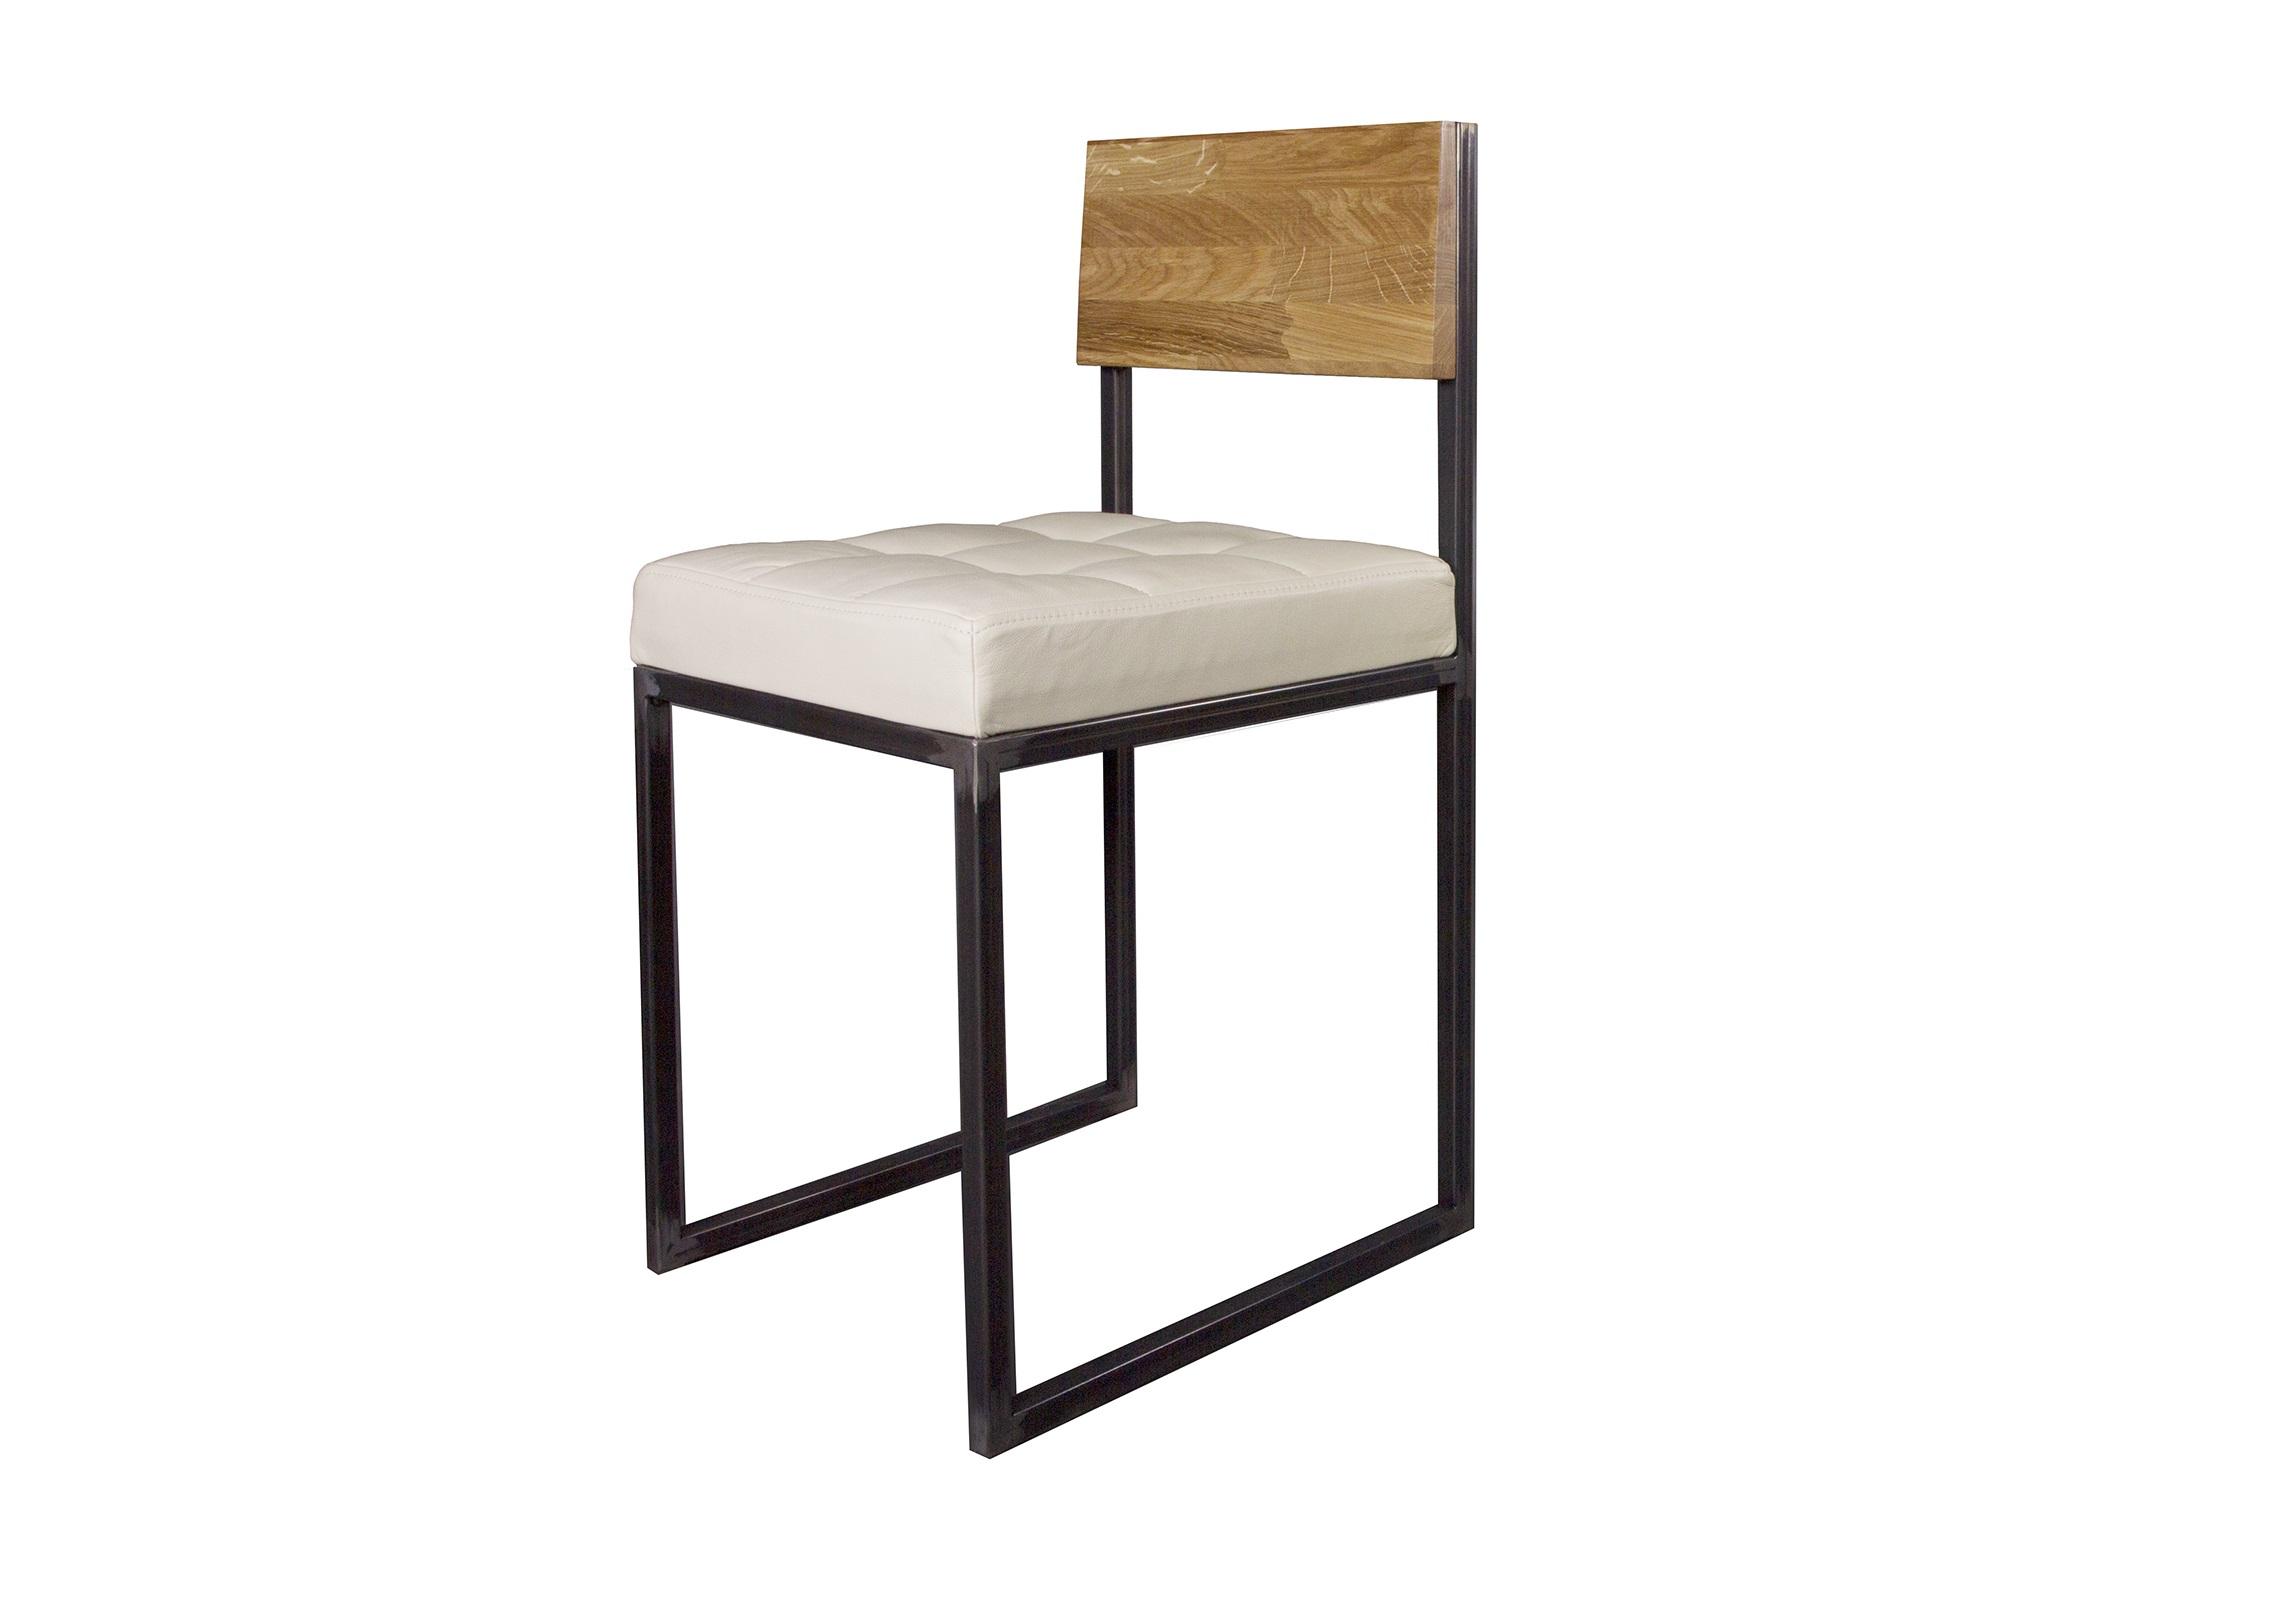 Кухонный стул Archpole 15430391 от thefurnish